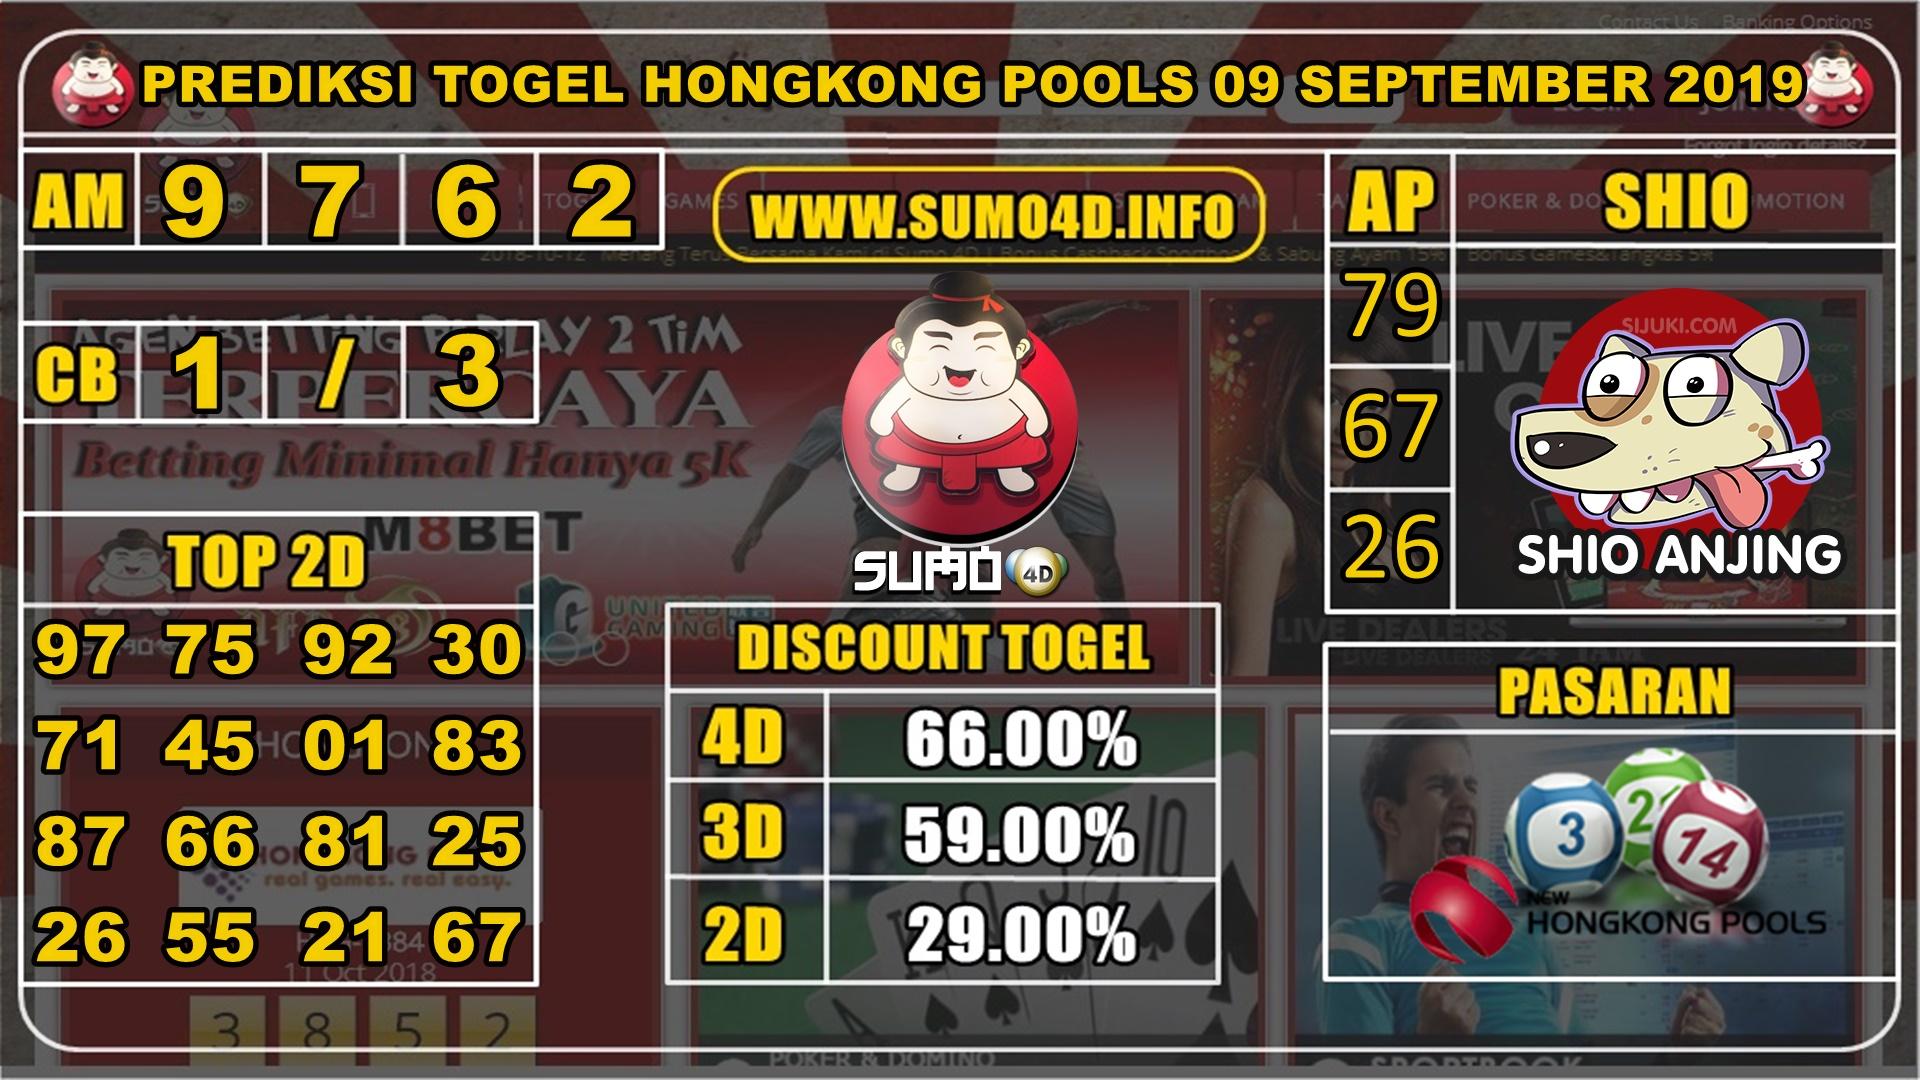 PREDIKSI TOGEL HONGKONG POOLS 09 SEPTEMBER 2019